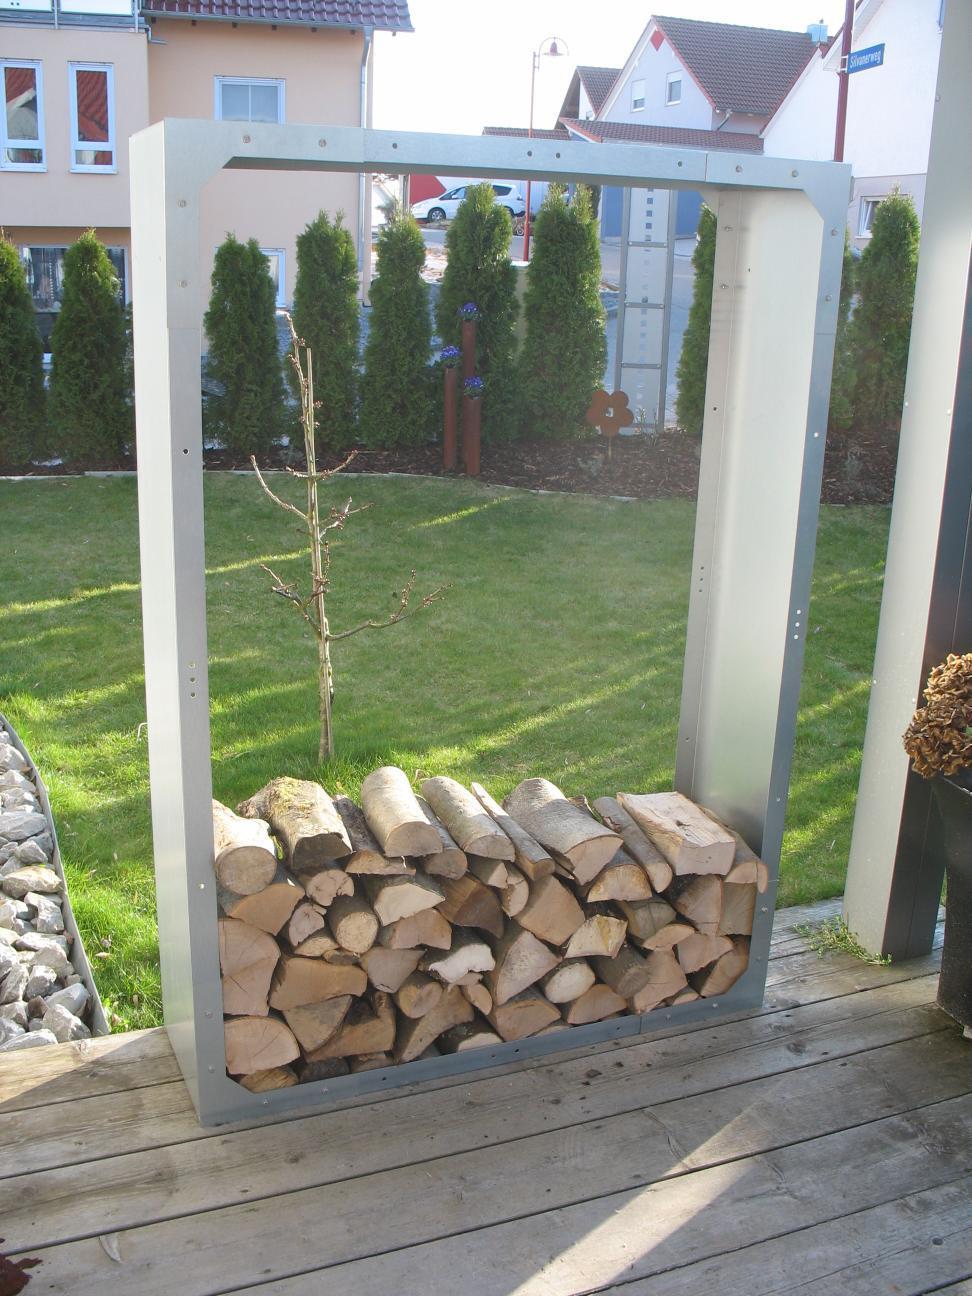 kaminholzregal brennholzregal aus metall aussen verzinkt. Black Bedroom Furniture Sets. Home Design Ideas